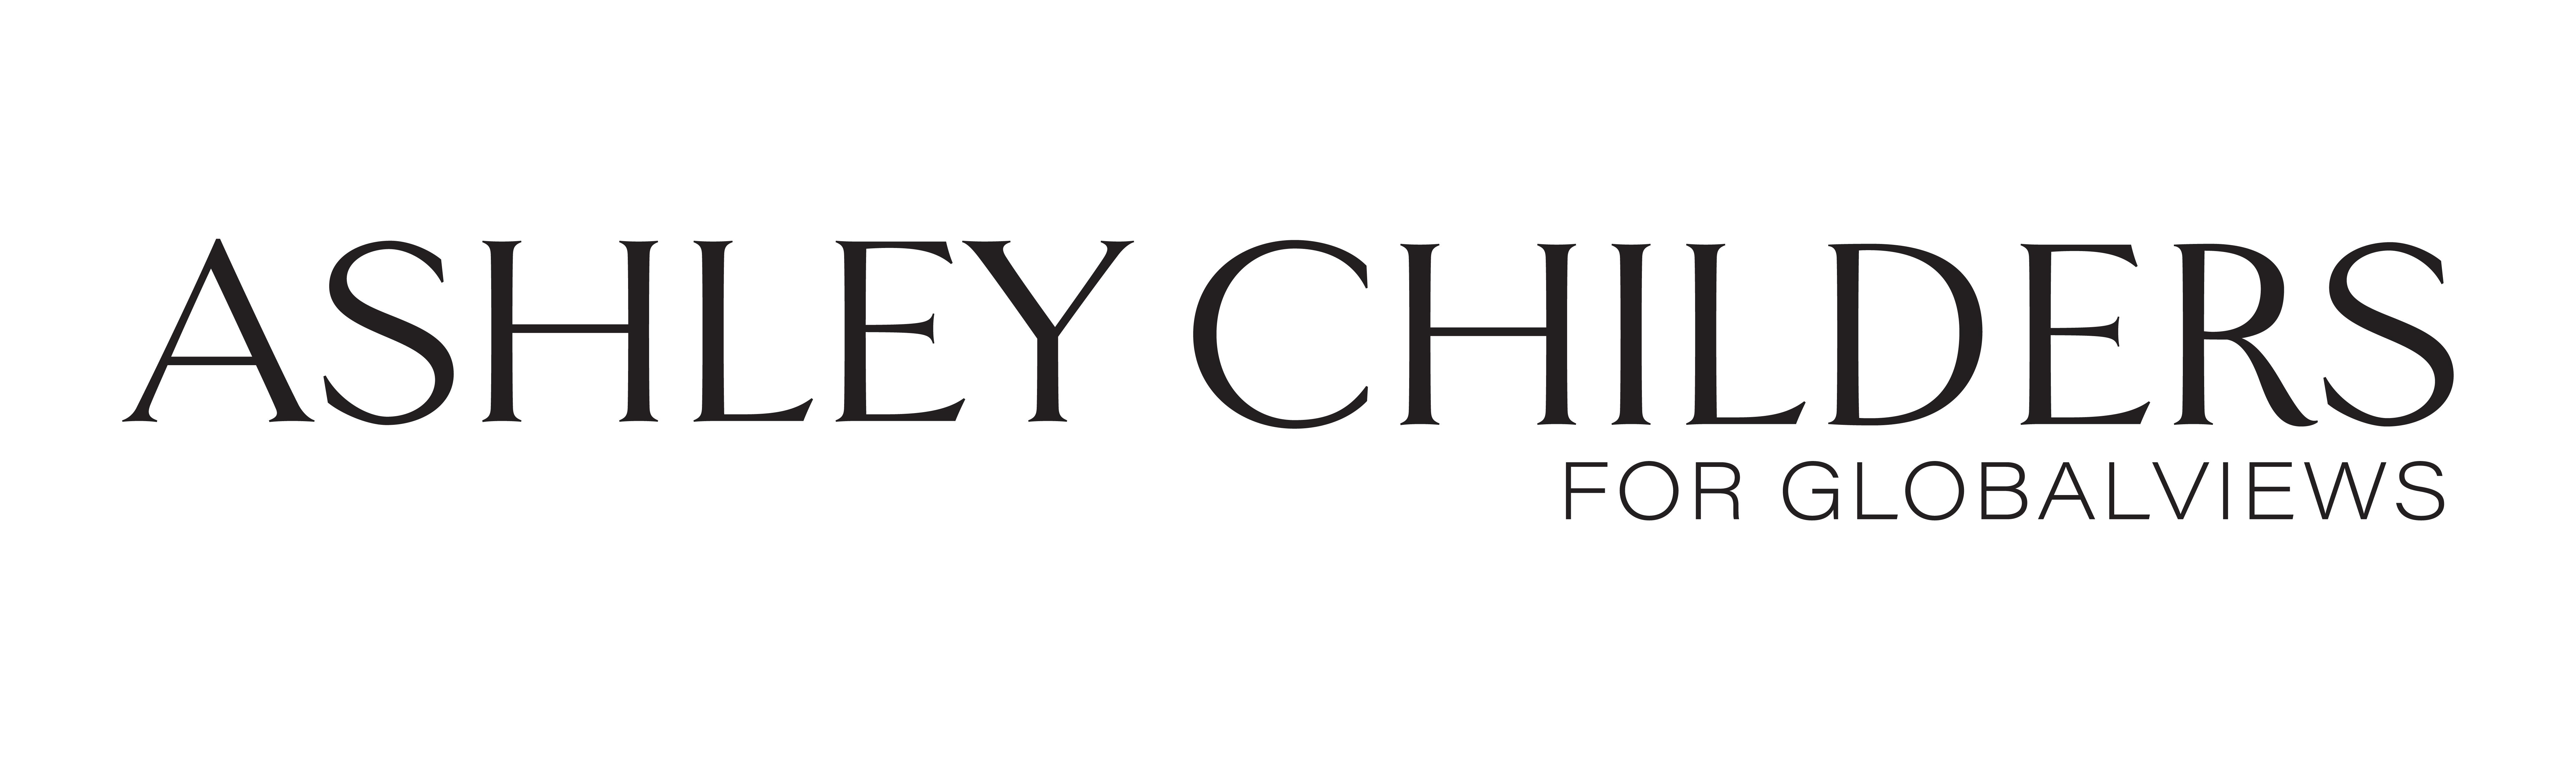 Ashley Childers